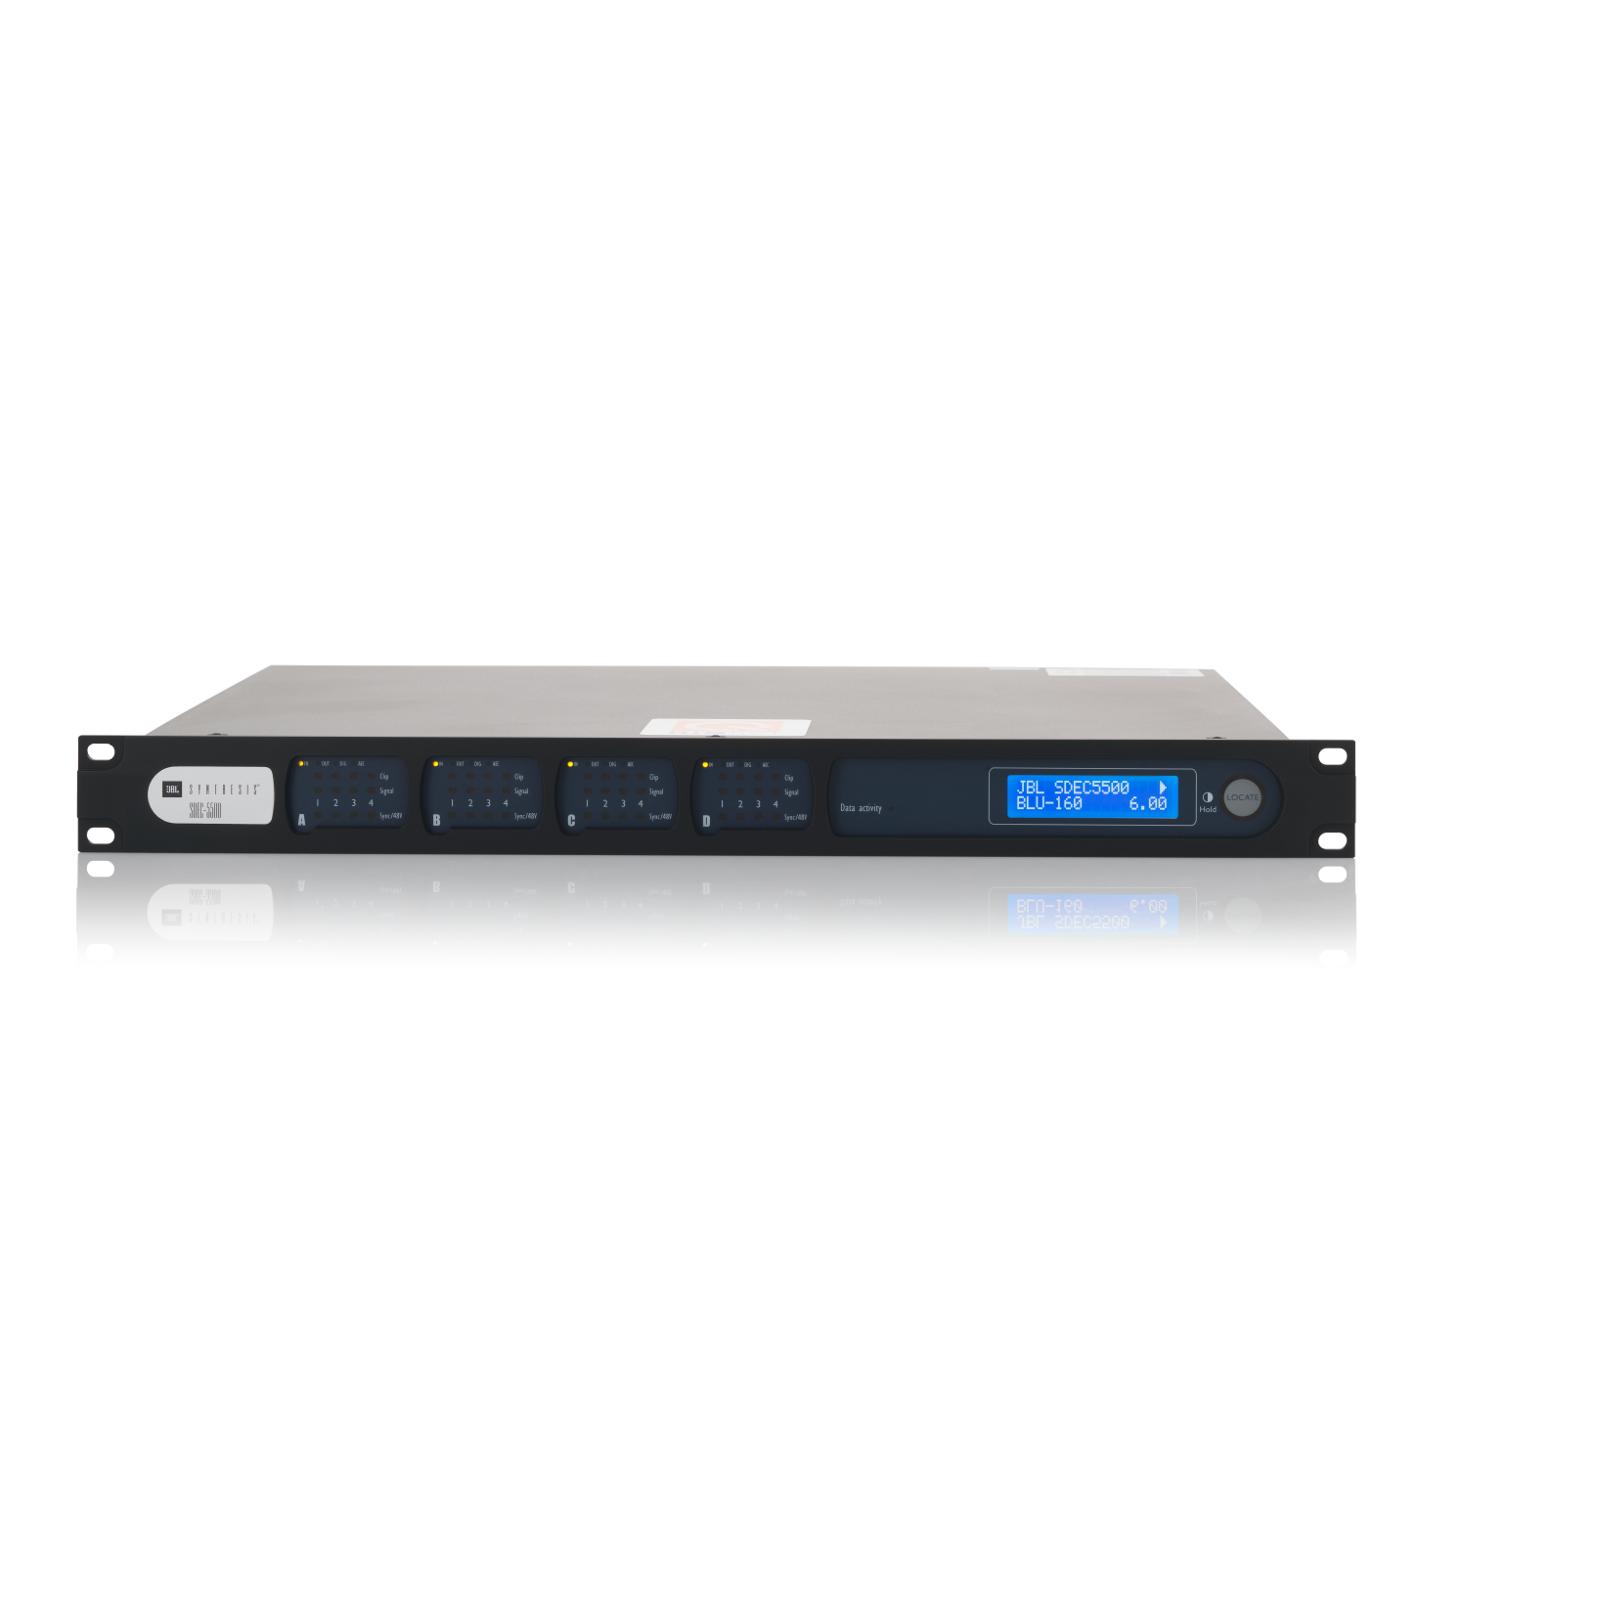 SDEC-5500 - Black Lacquer - 16-channel Fully-balanced Digital Equalizer - Front